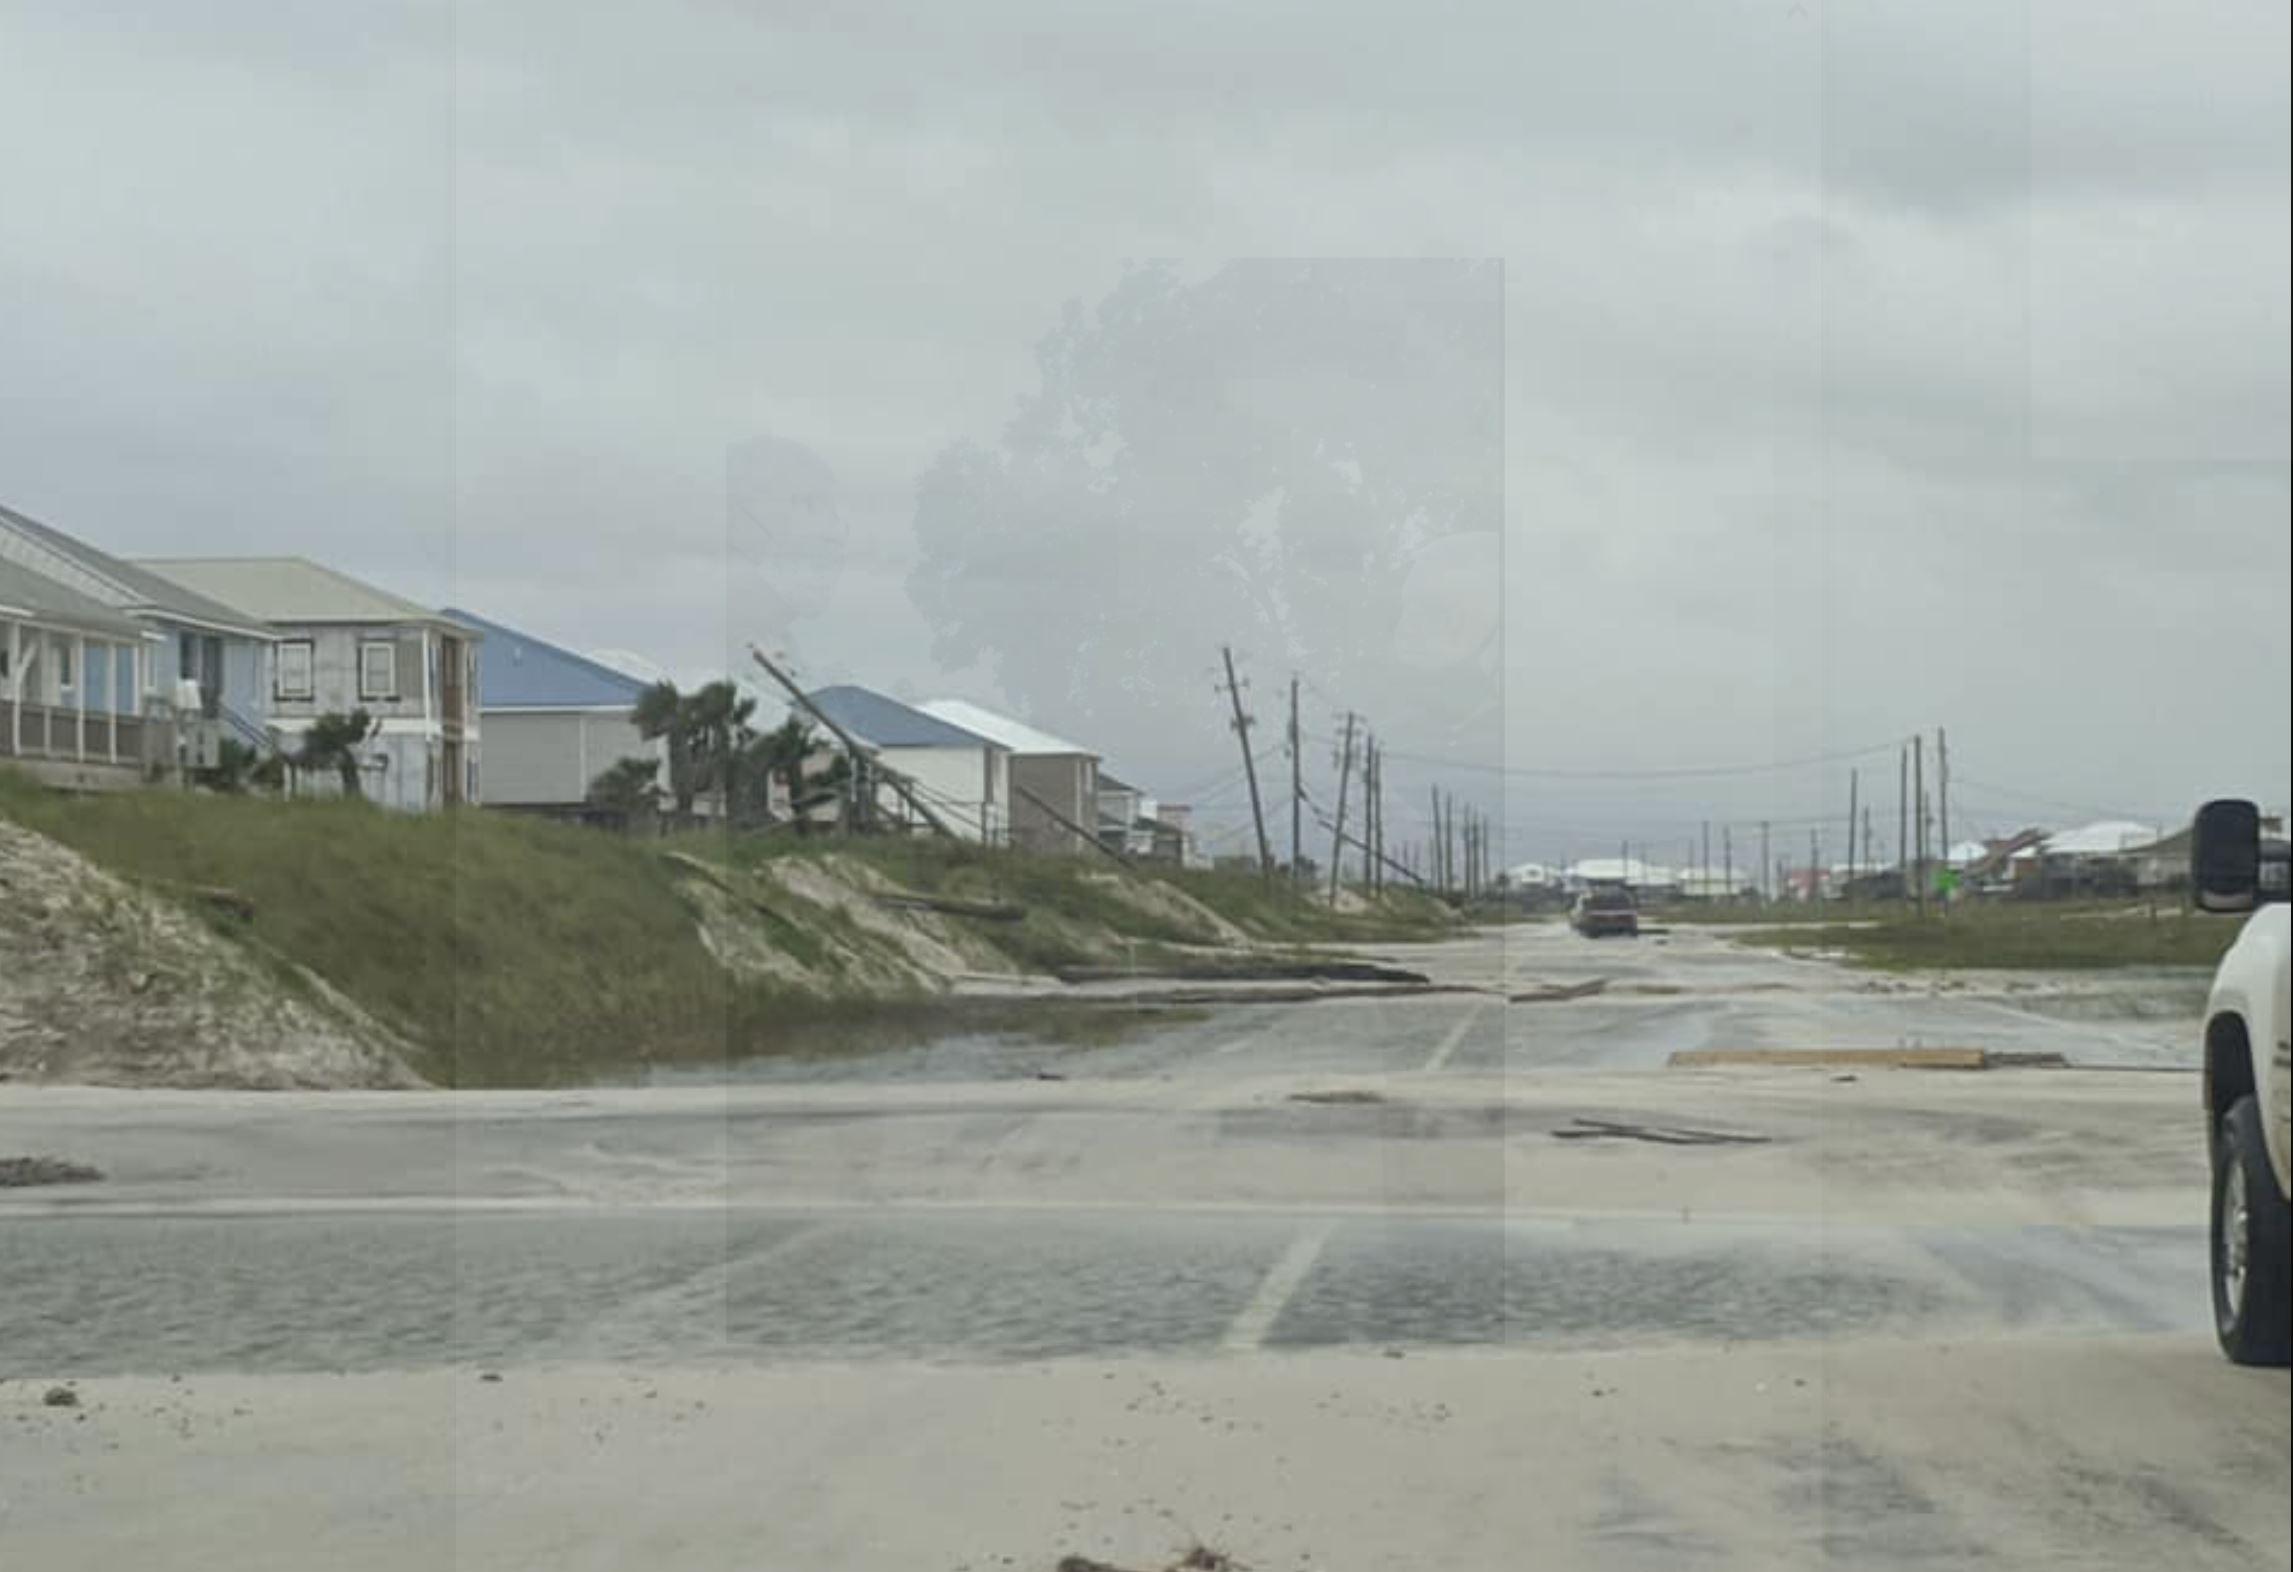 Hurricane Sally unleashes flooding, hundreds rescued